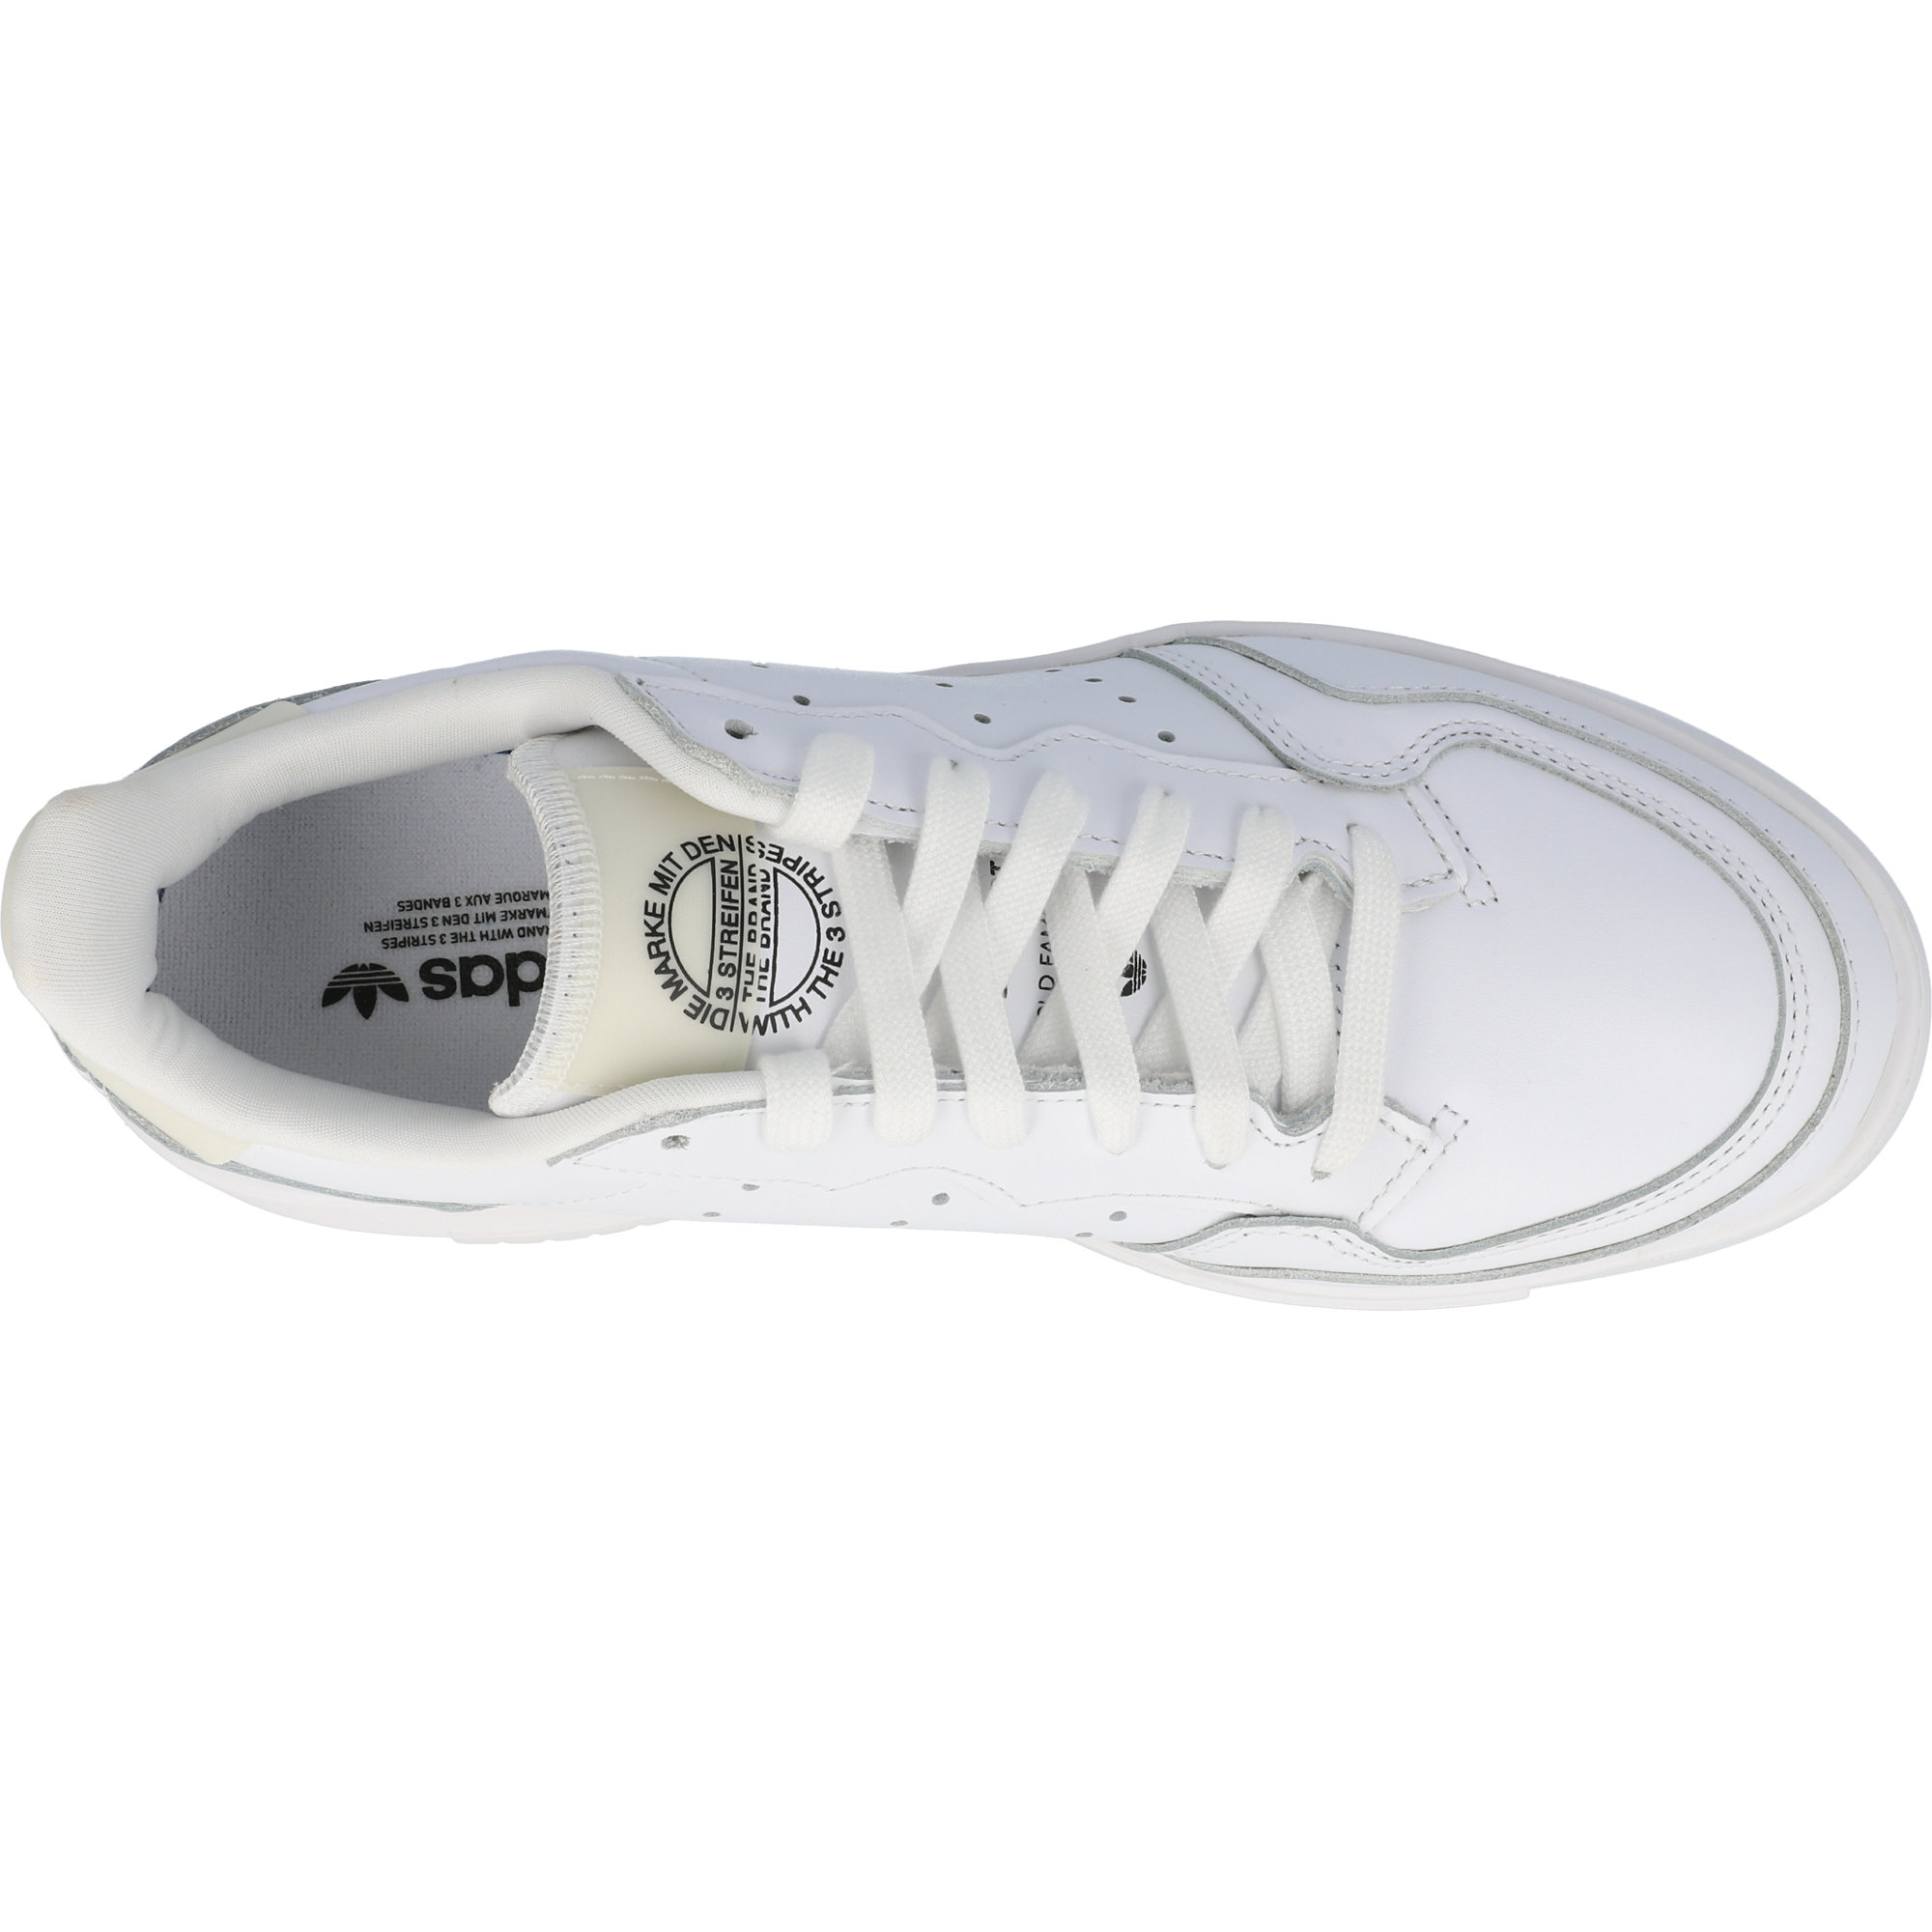 adidas Originals Supercourt W White/Core Black Leather